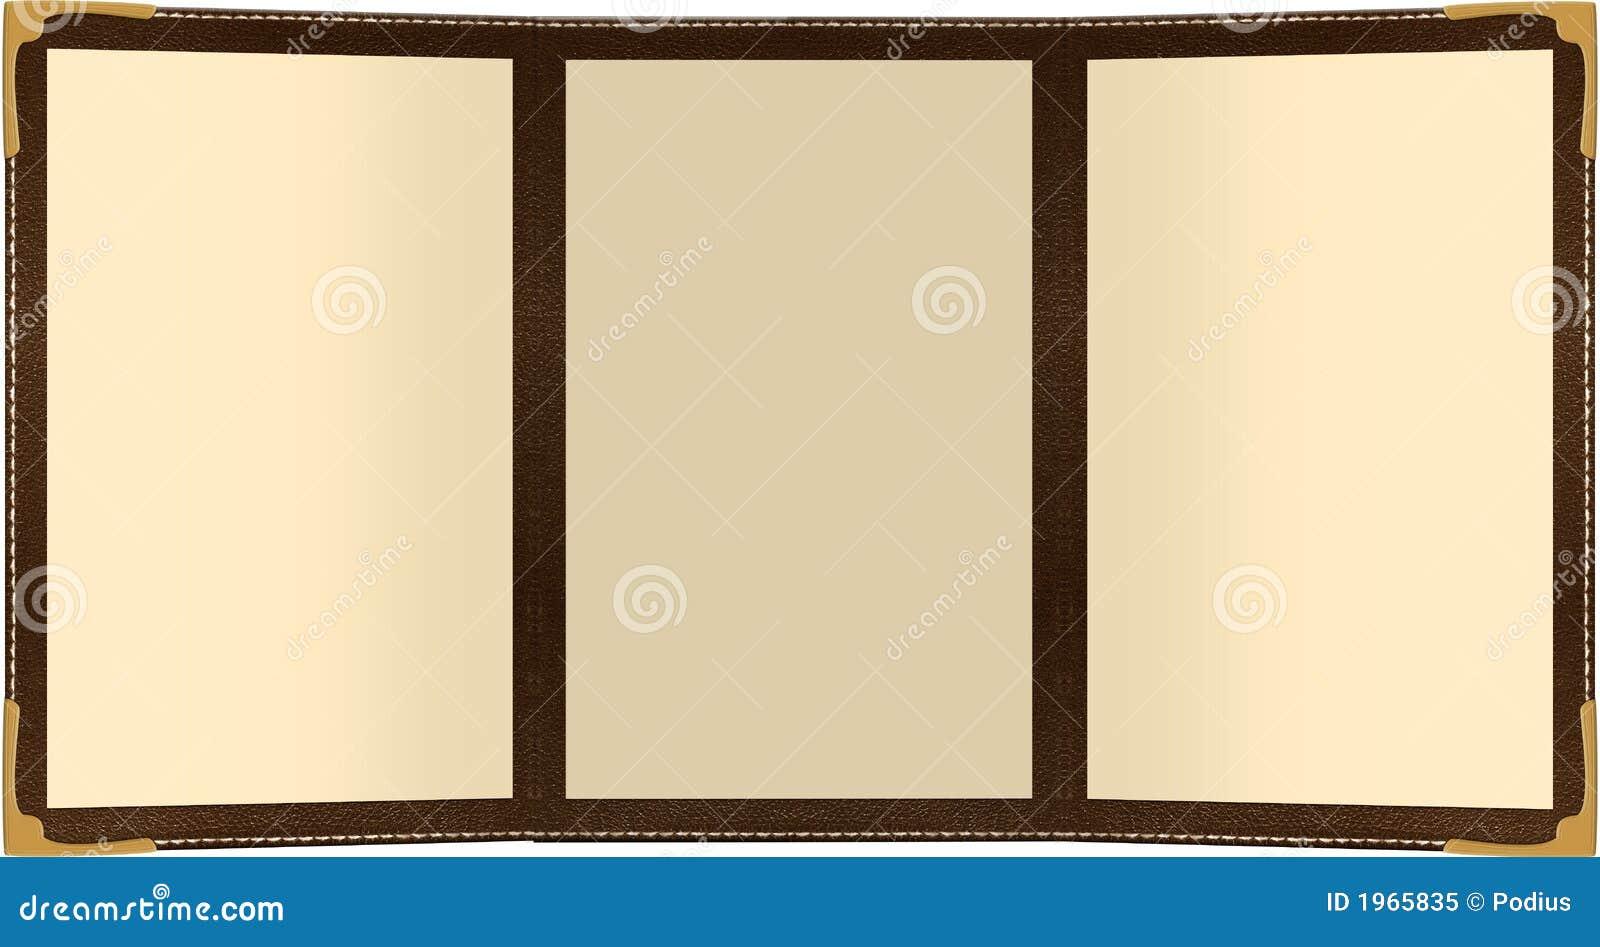 Free blank tri fold template trattorialeondoro maxwellsz